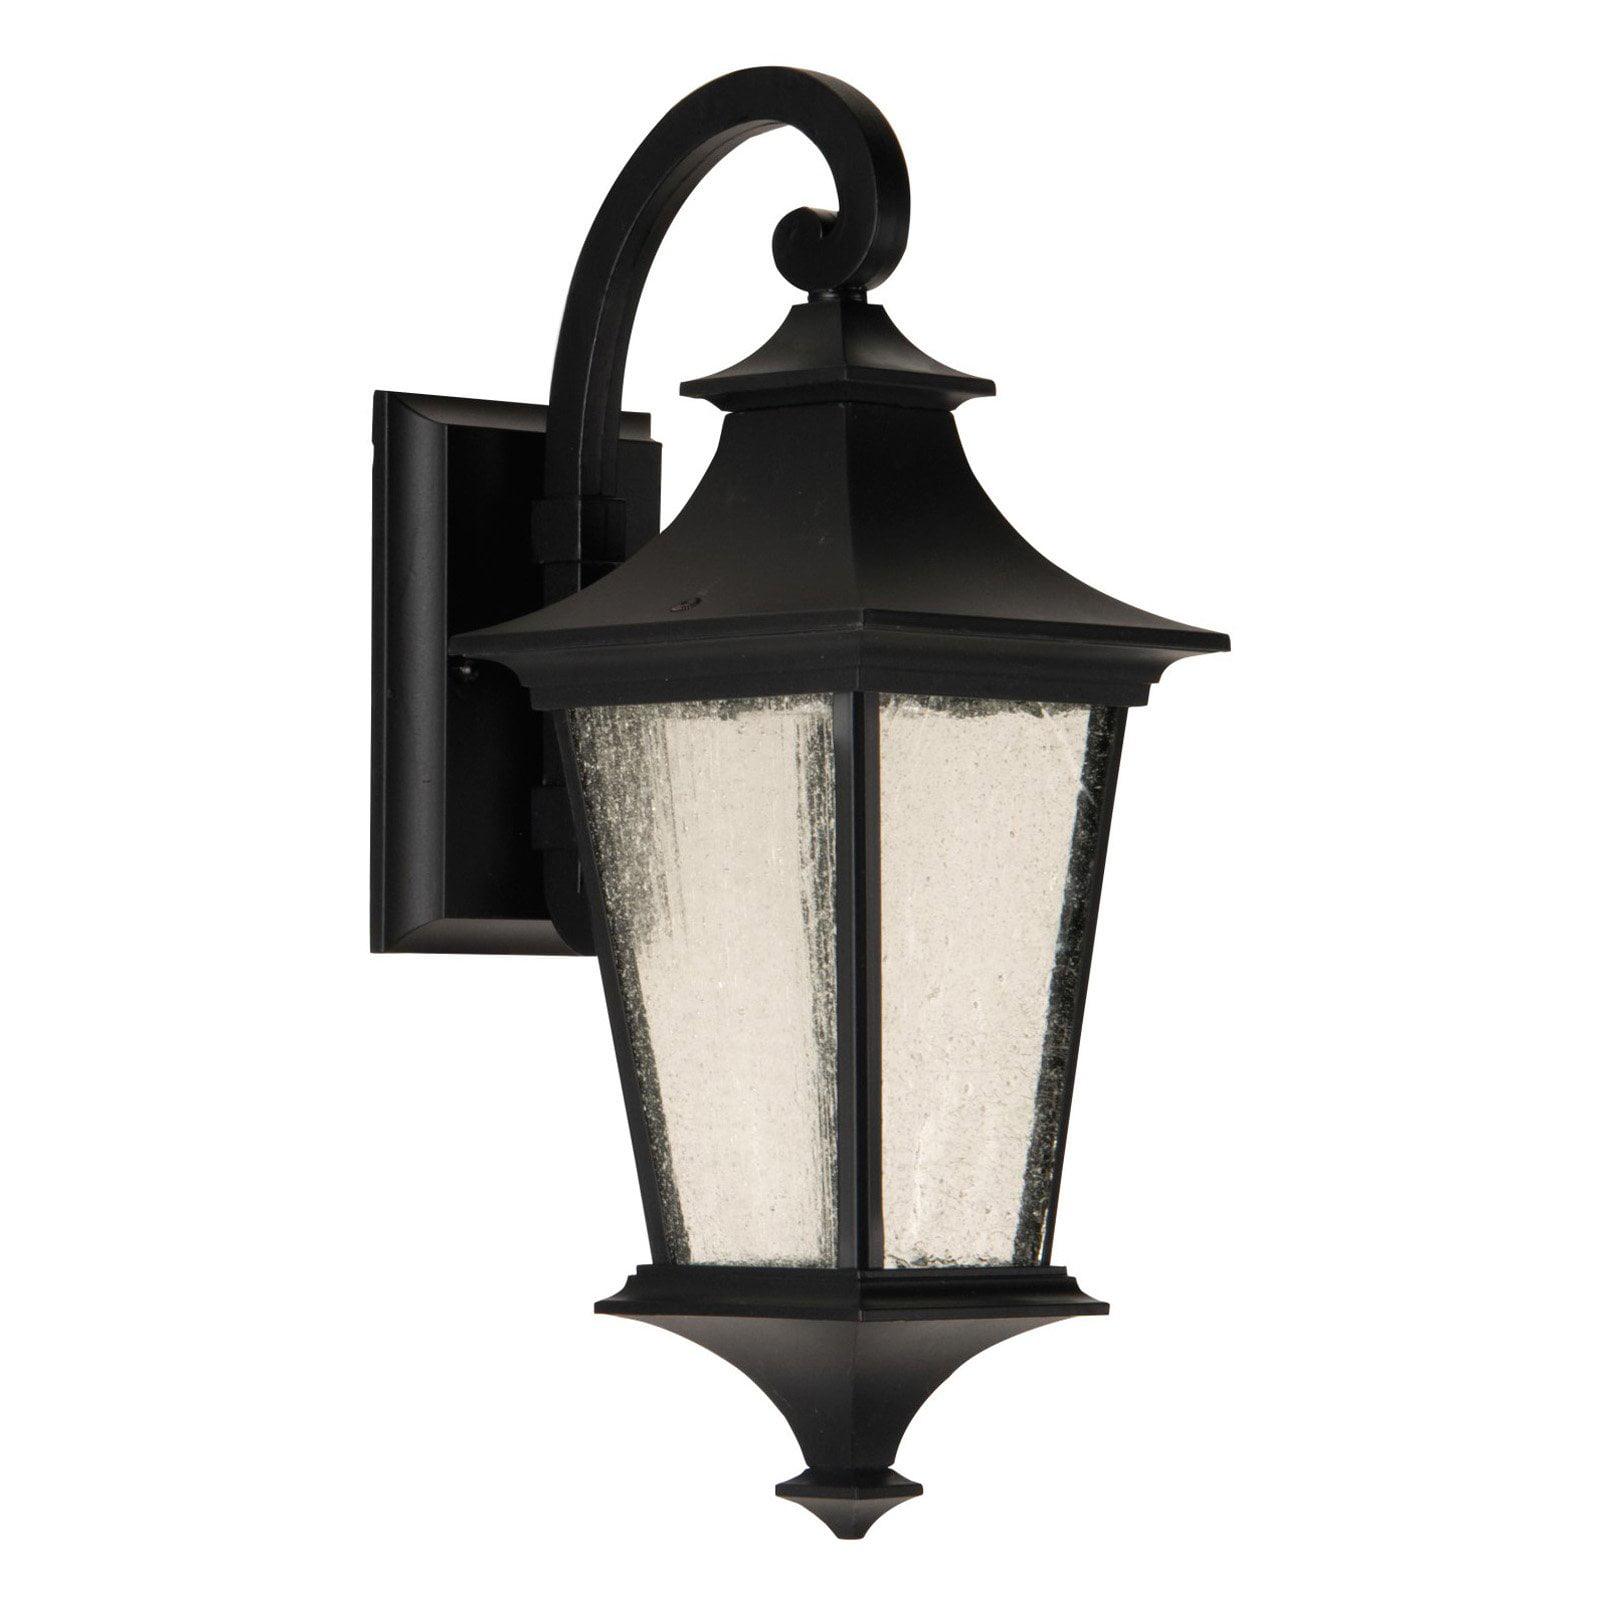 Craftmade Argent II LED Z1354 Outdoor Wall Light